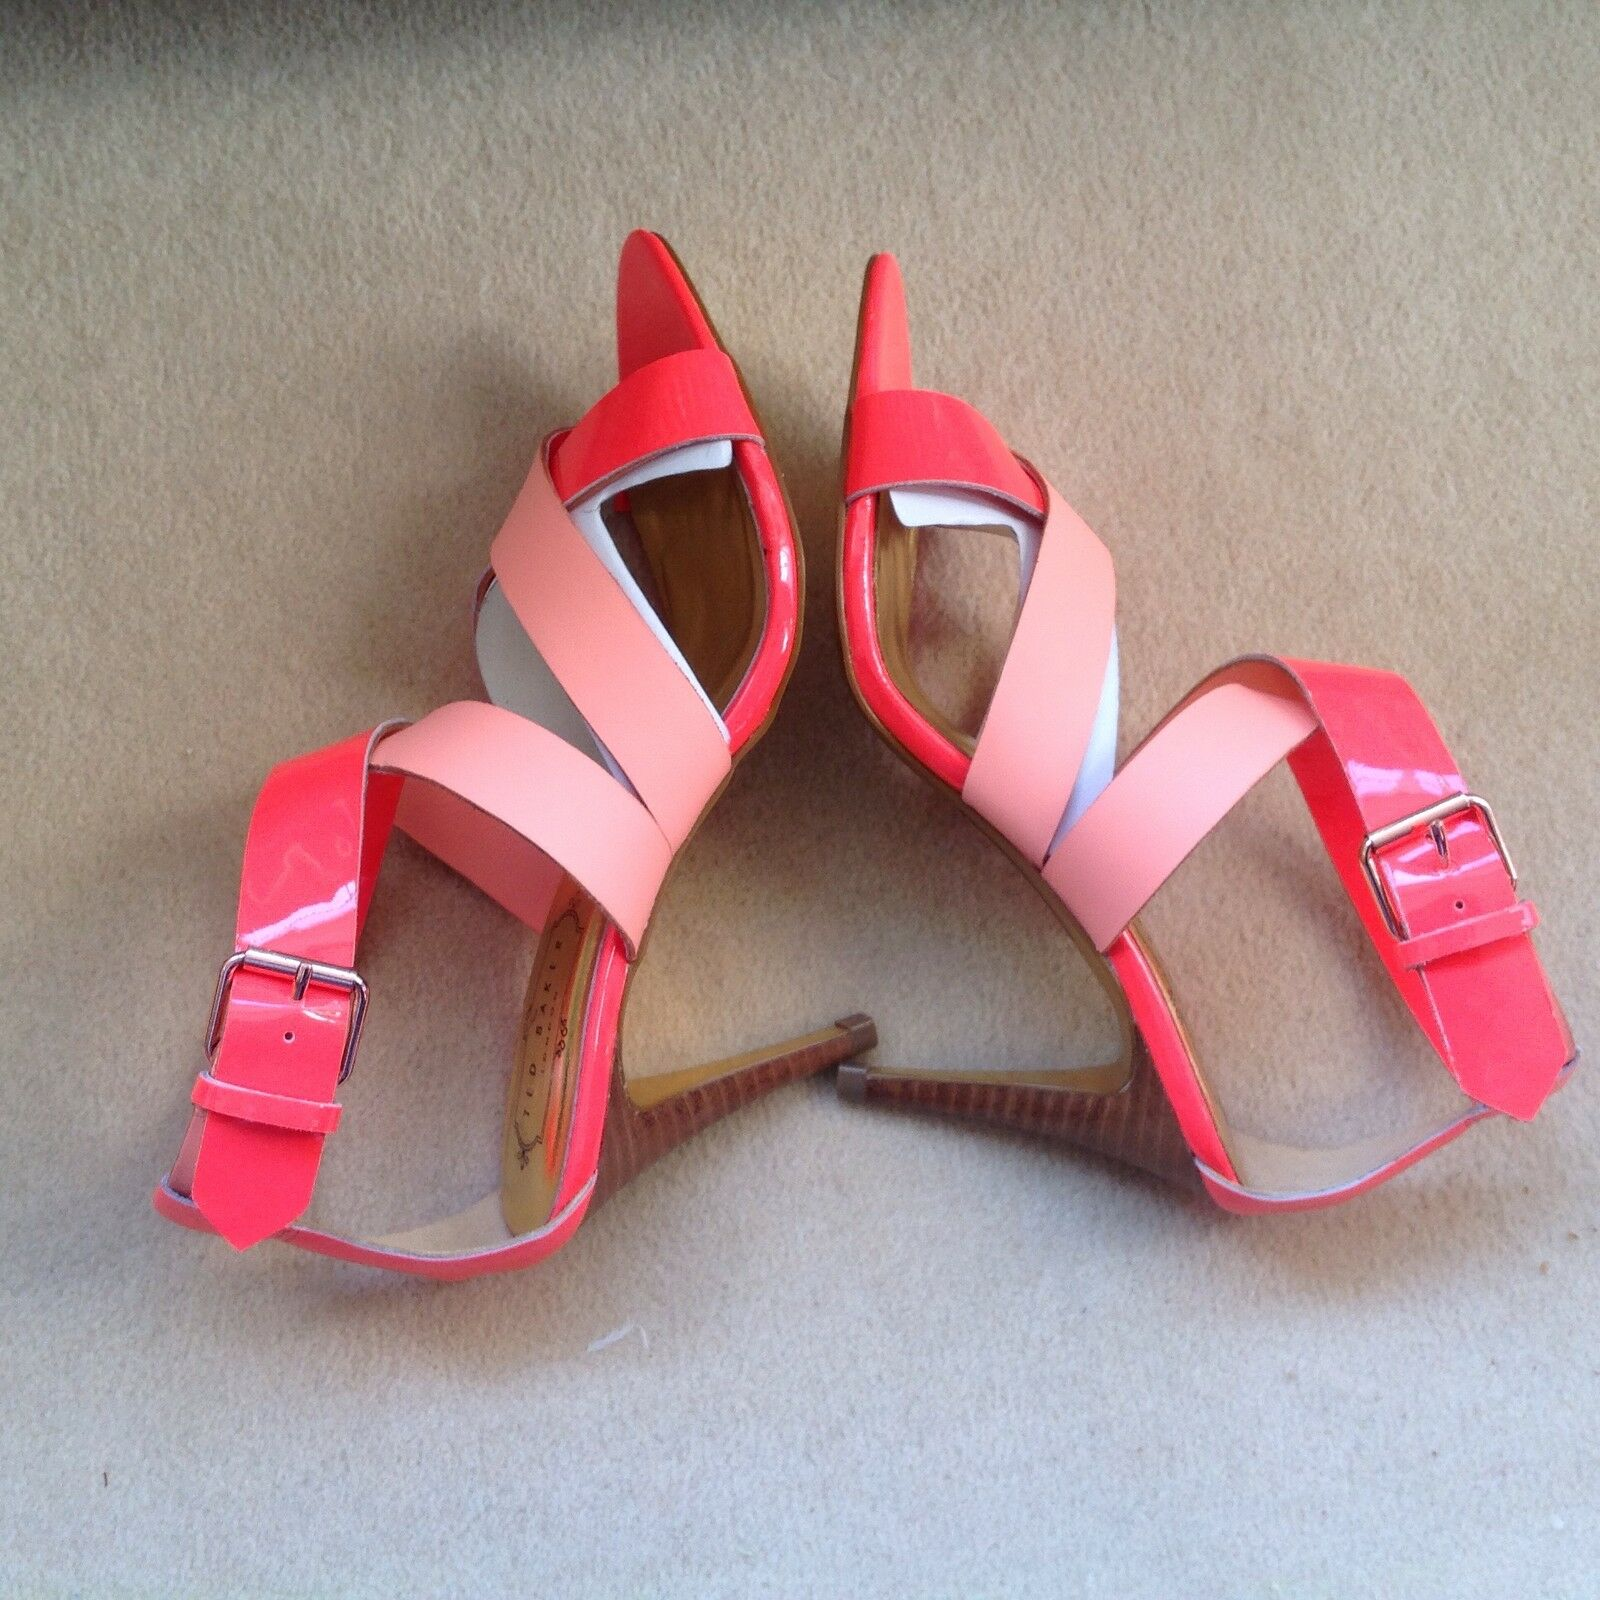 TED BAKER Gladiator Heel Sandales in Pink and Orange.NEU 4 UK.